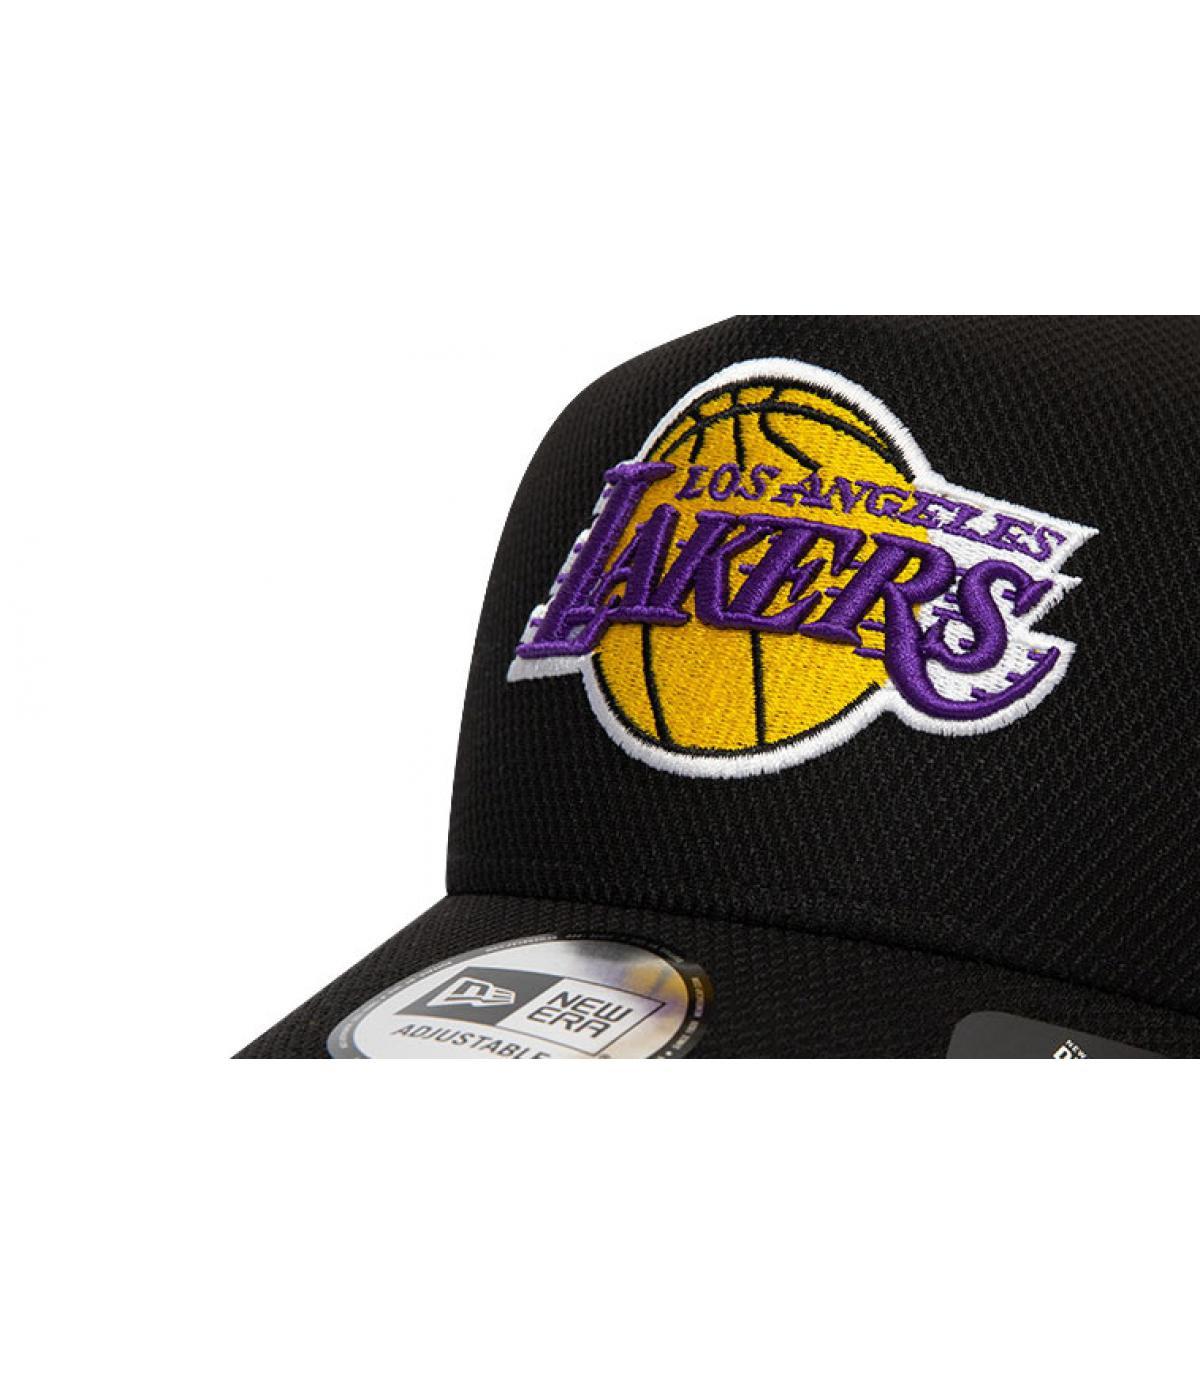 Details League Ess Lakers Diamond Era Aframe - afbeeling 3